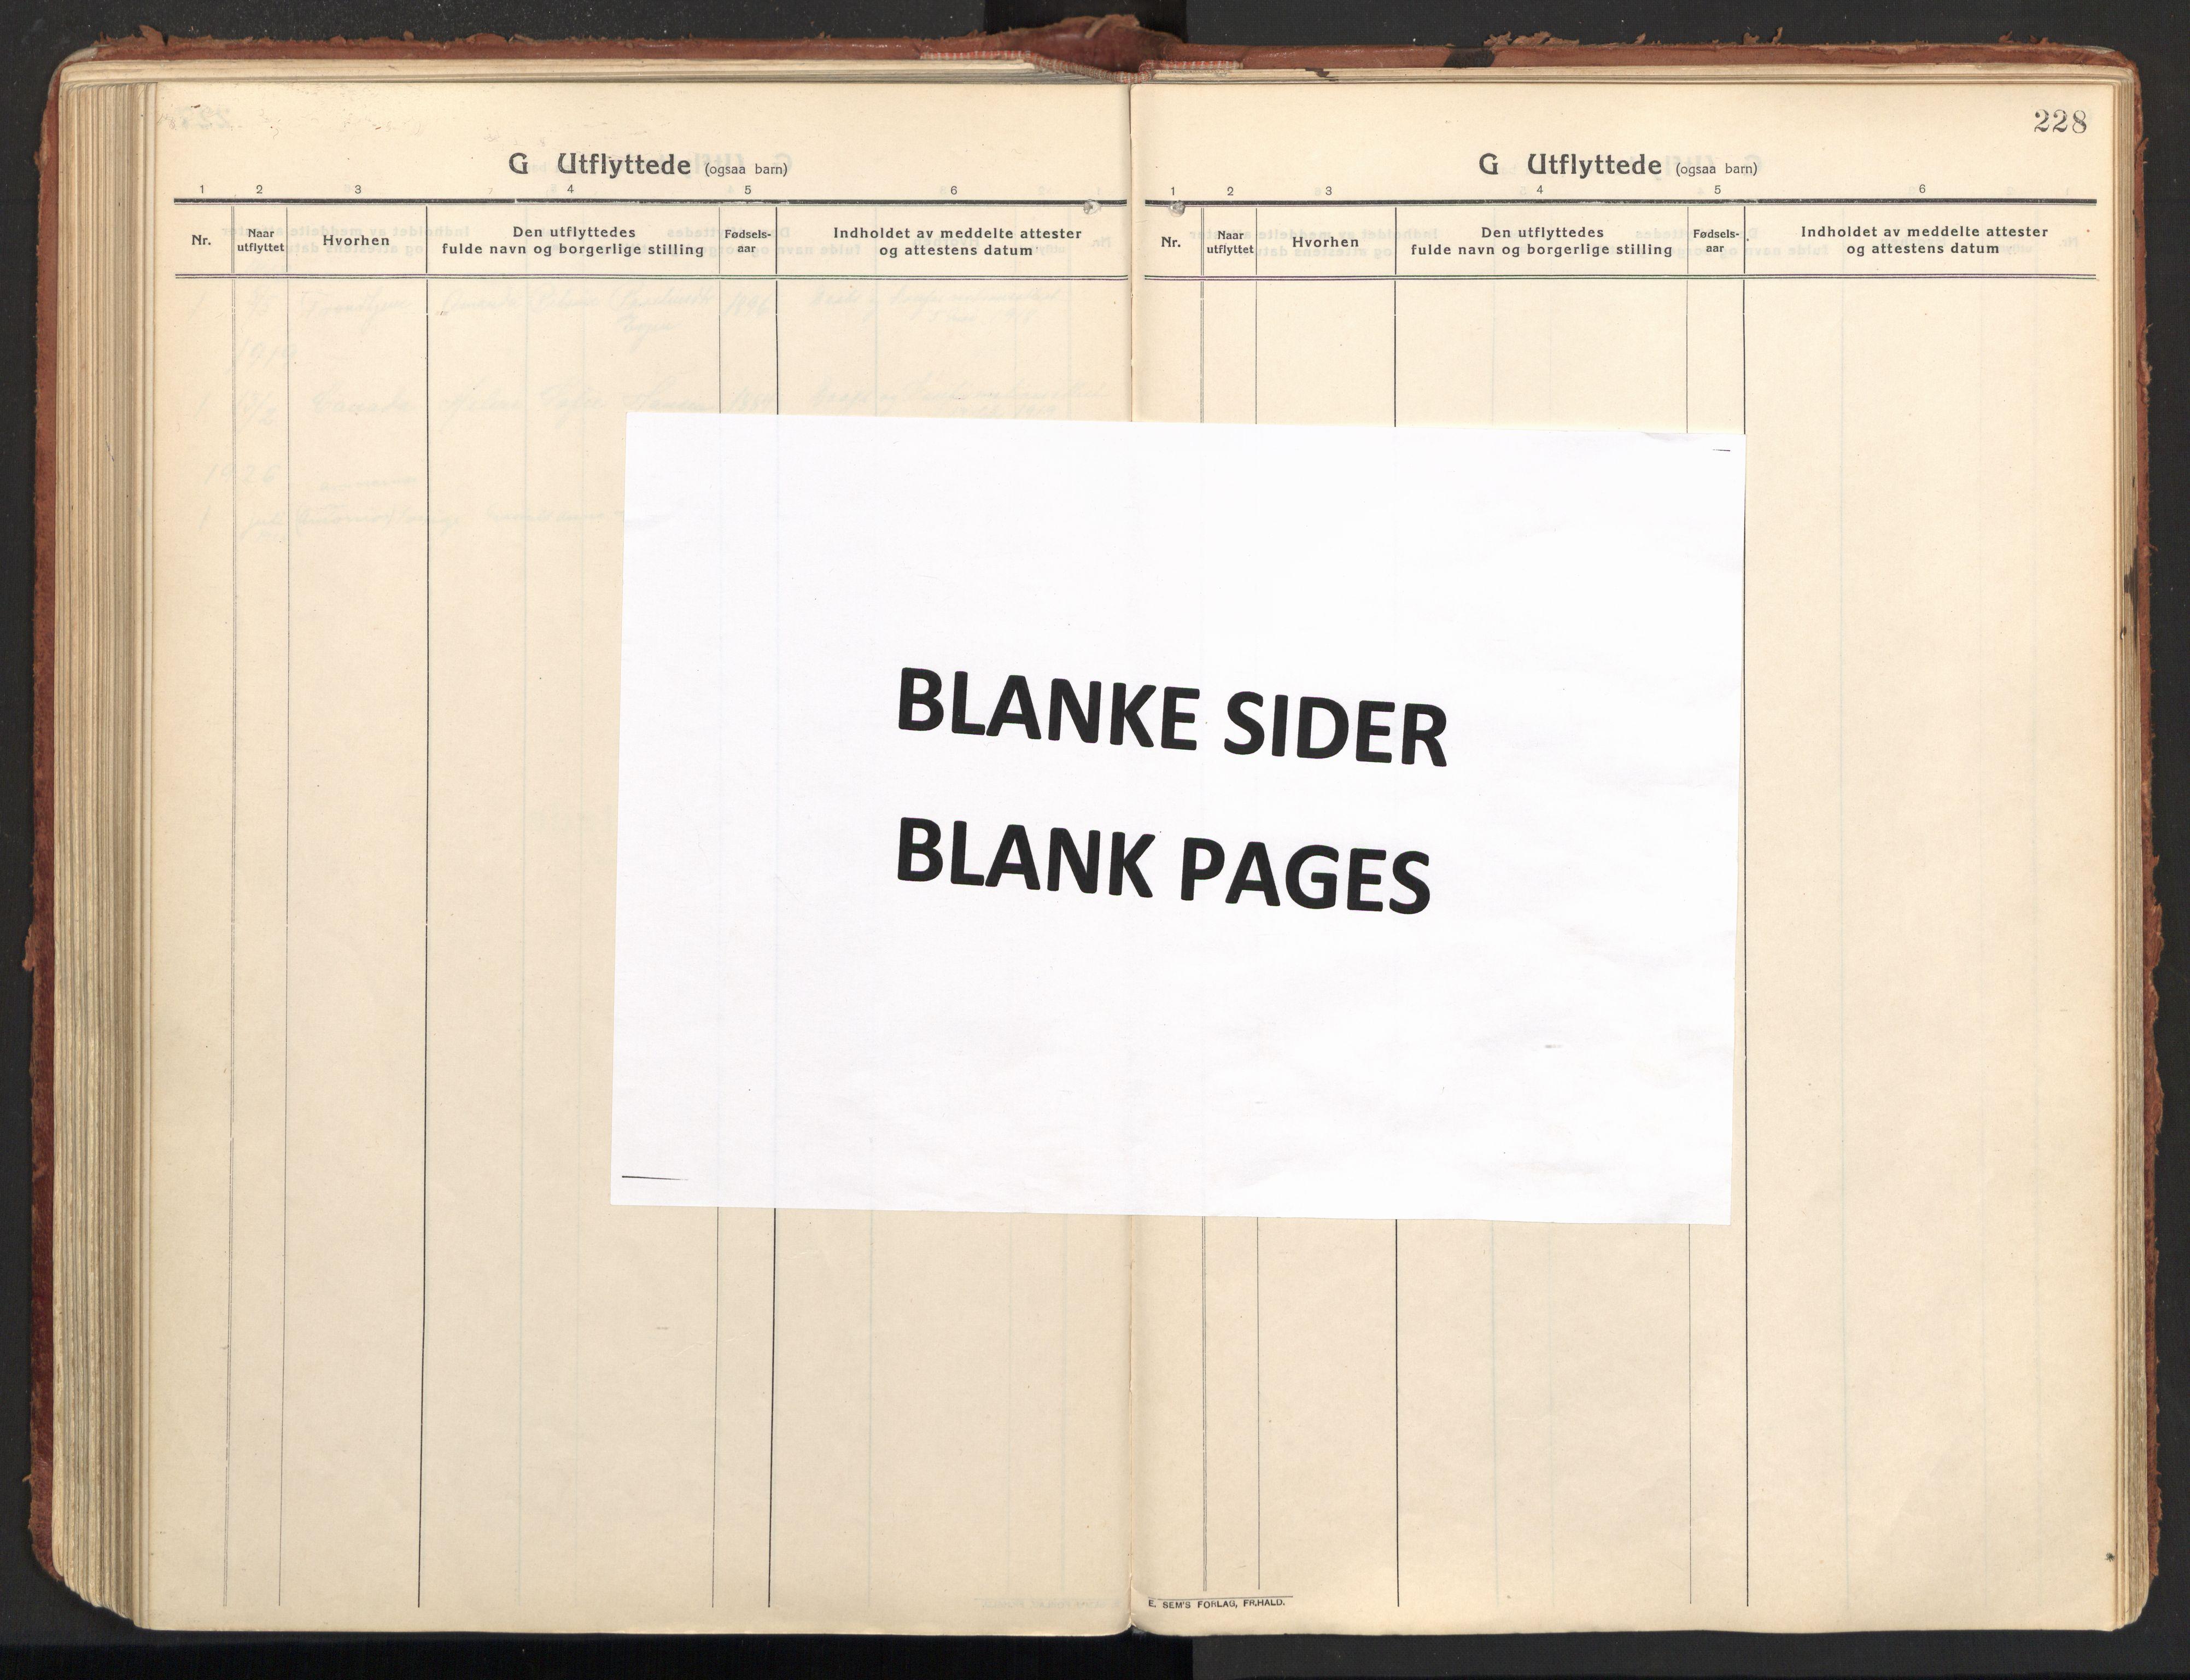 SAT, Ministerialprotokoller, klokkerbøker og fødselsregistre - Nordland, 846/L0650: Ministerialbok nr. 846A08, 1916-1935, s. 228